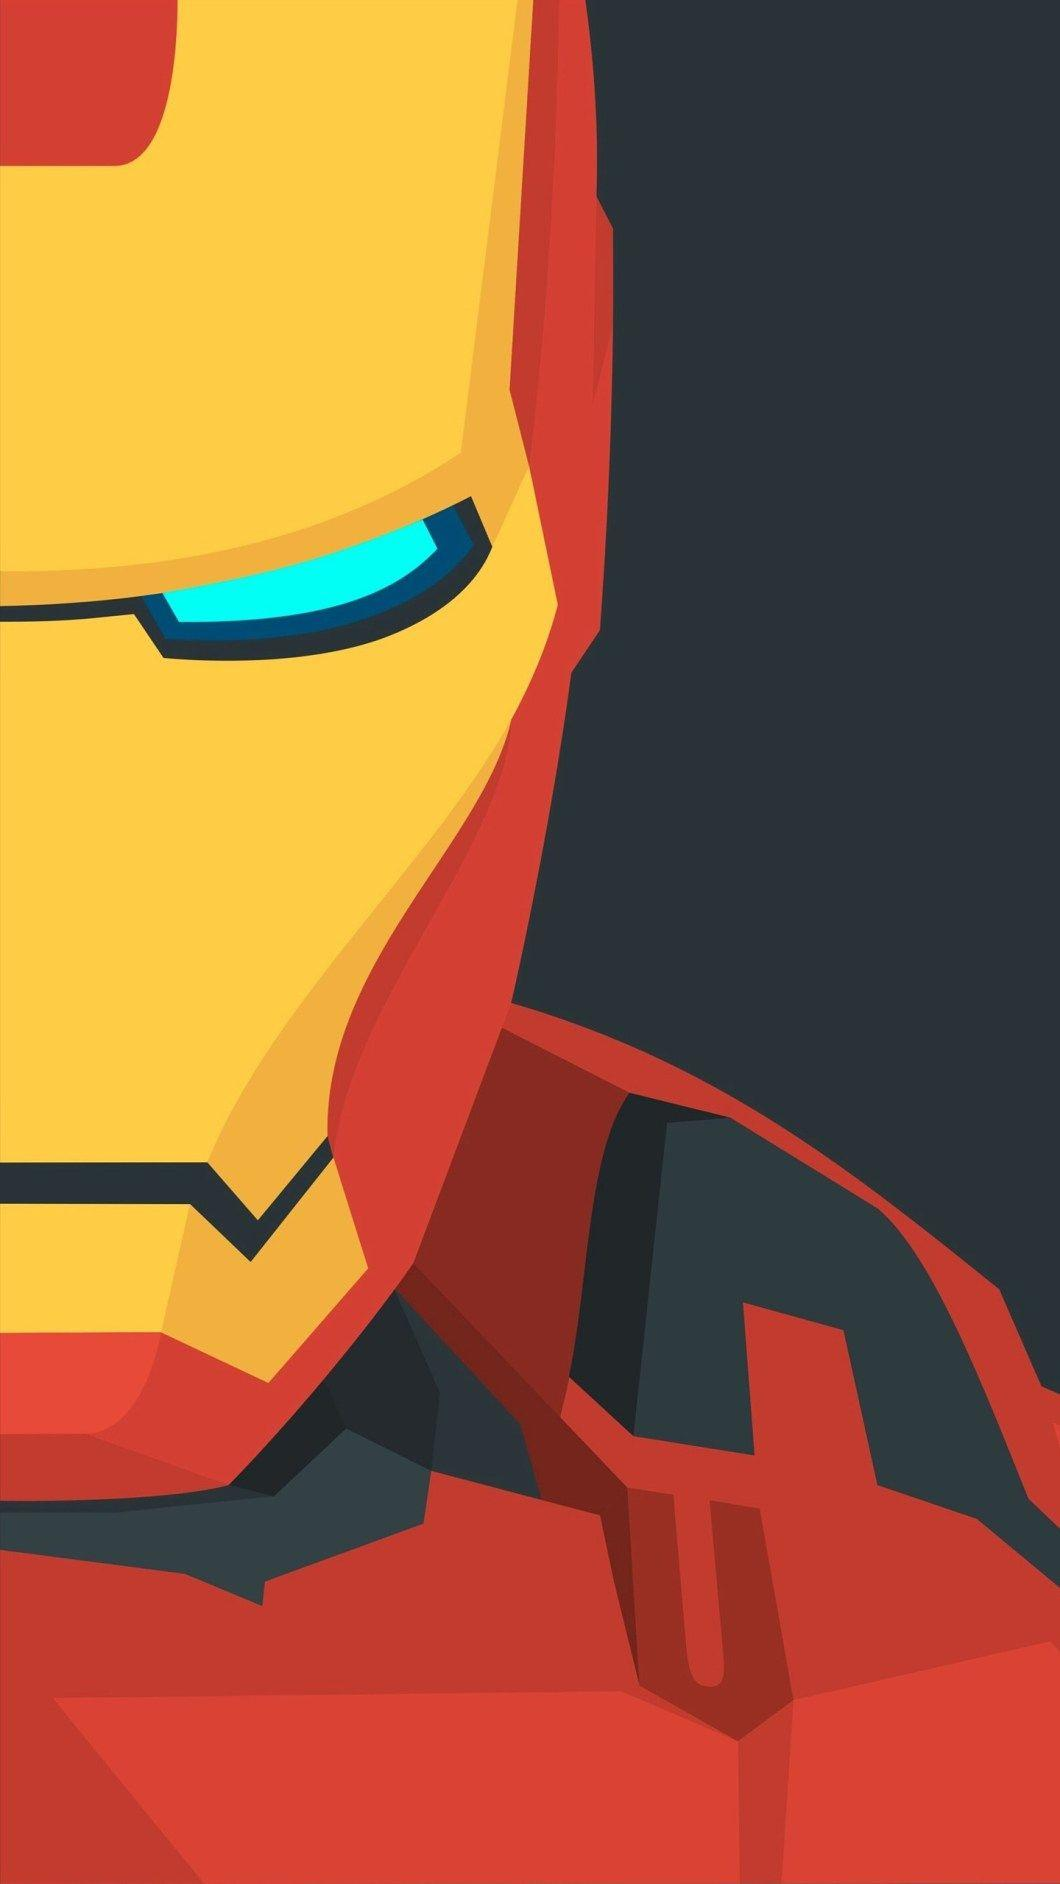 Iron Man Iphone Wallpapers Wallpaper Cave